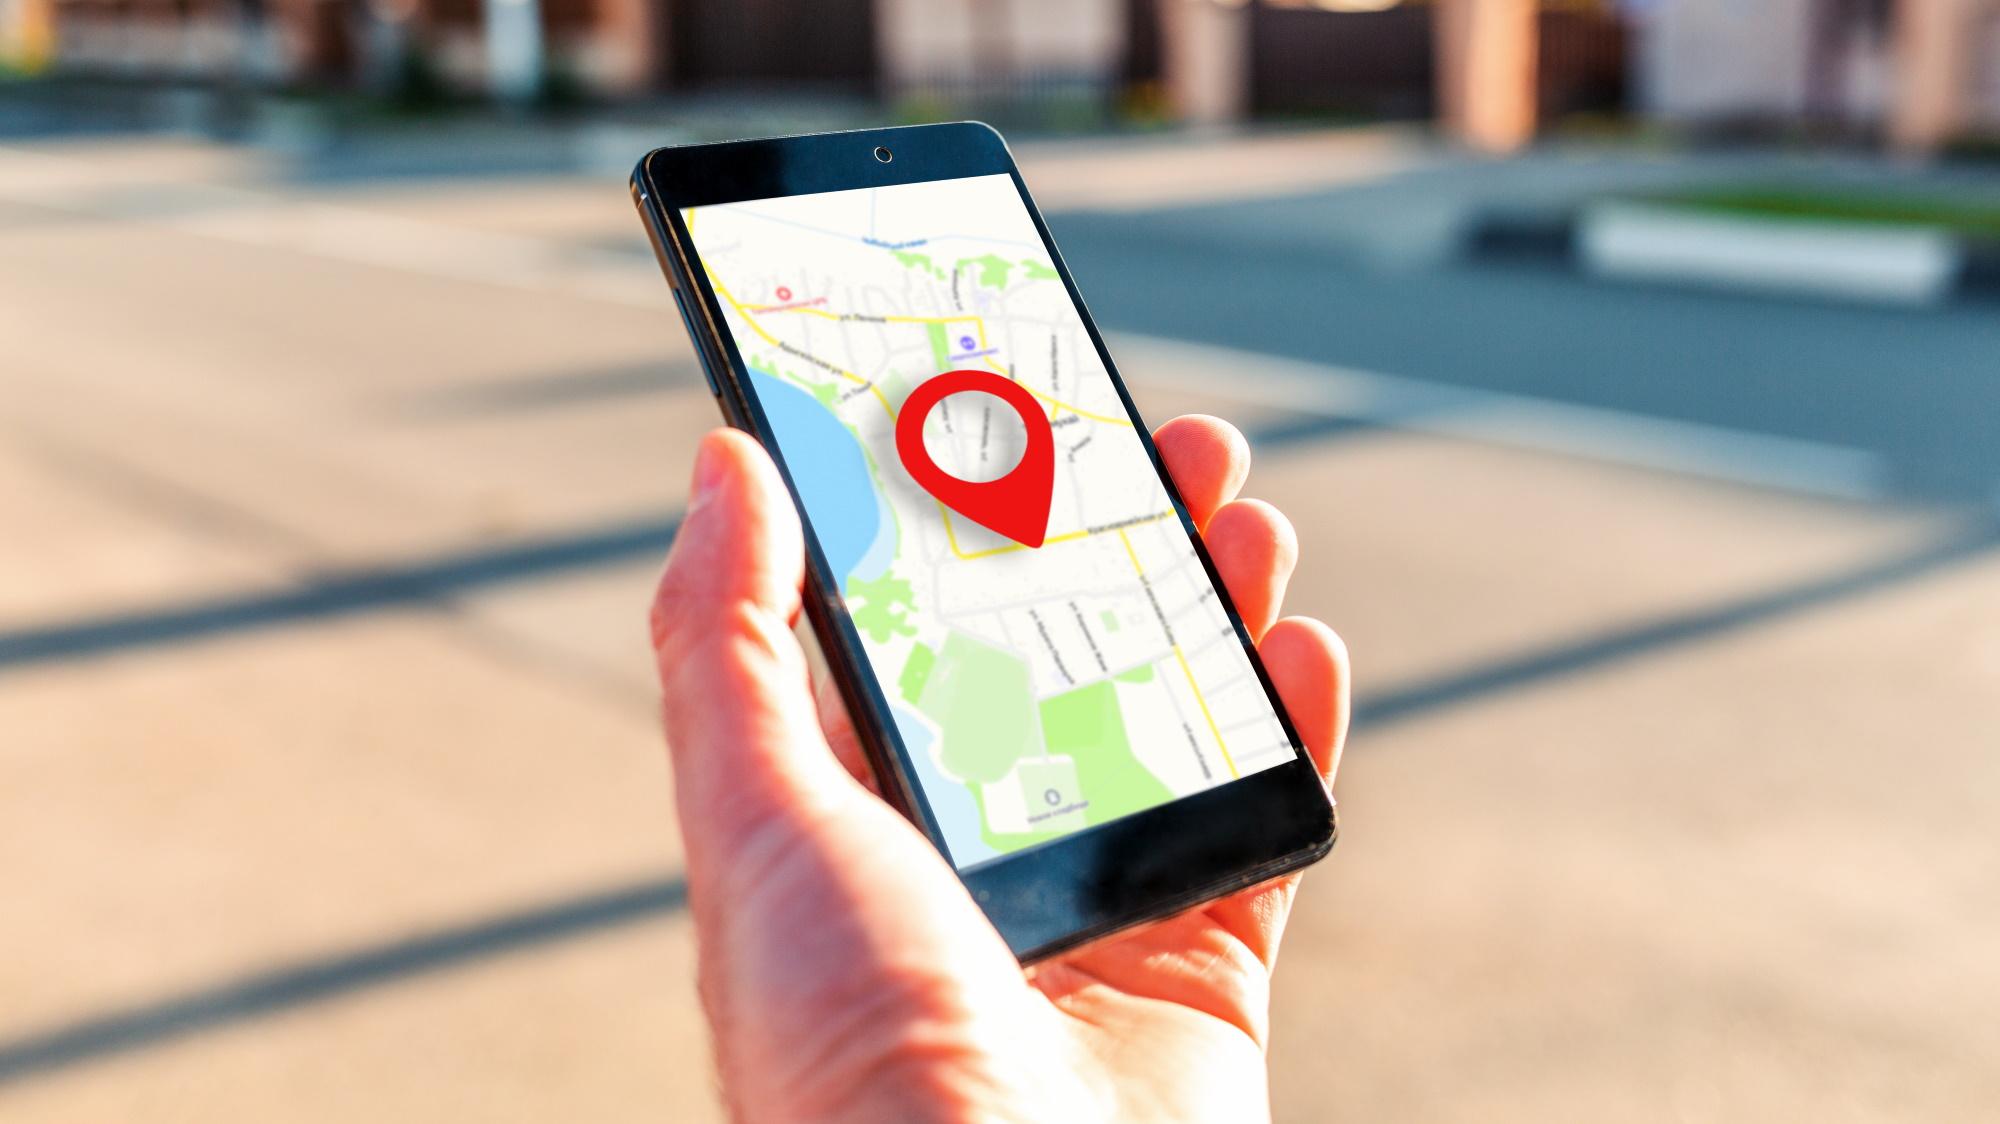 Faken pokemon gps go handy Fake GPS